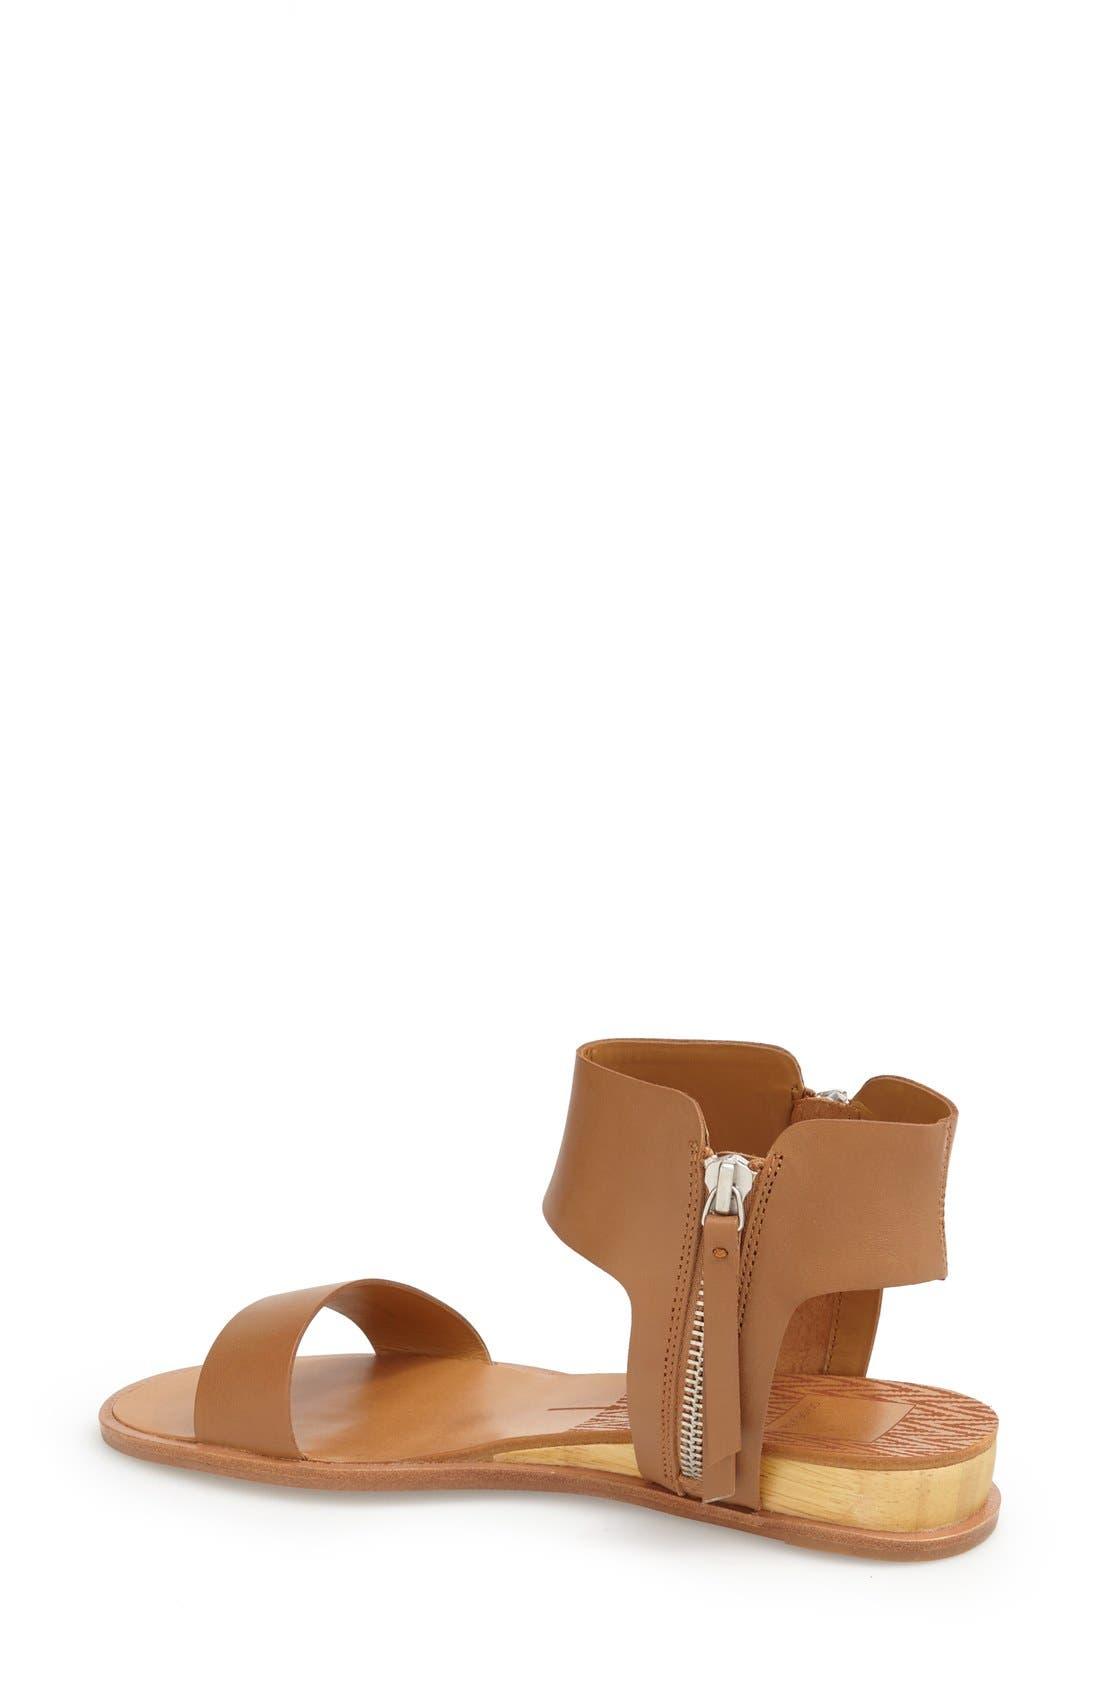 Alternate Image 2  - Dolce Vita 'Paris' Ankle Cuff Sandal (Women)